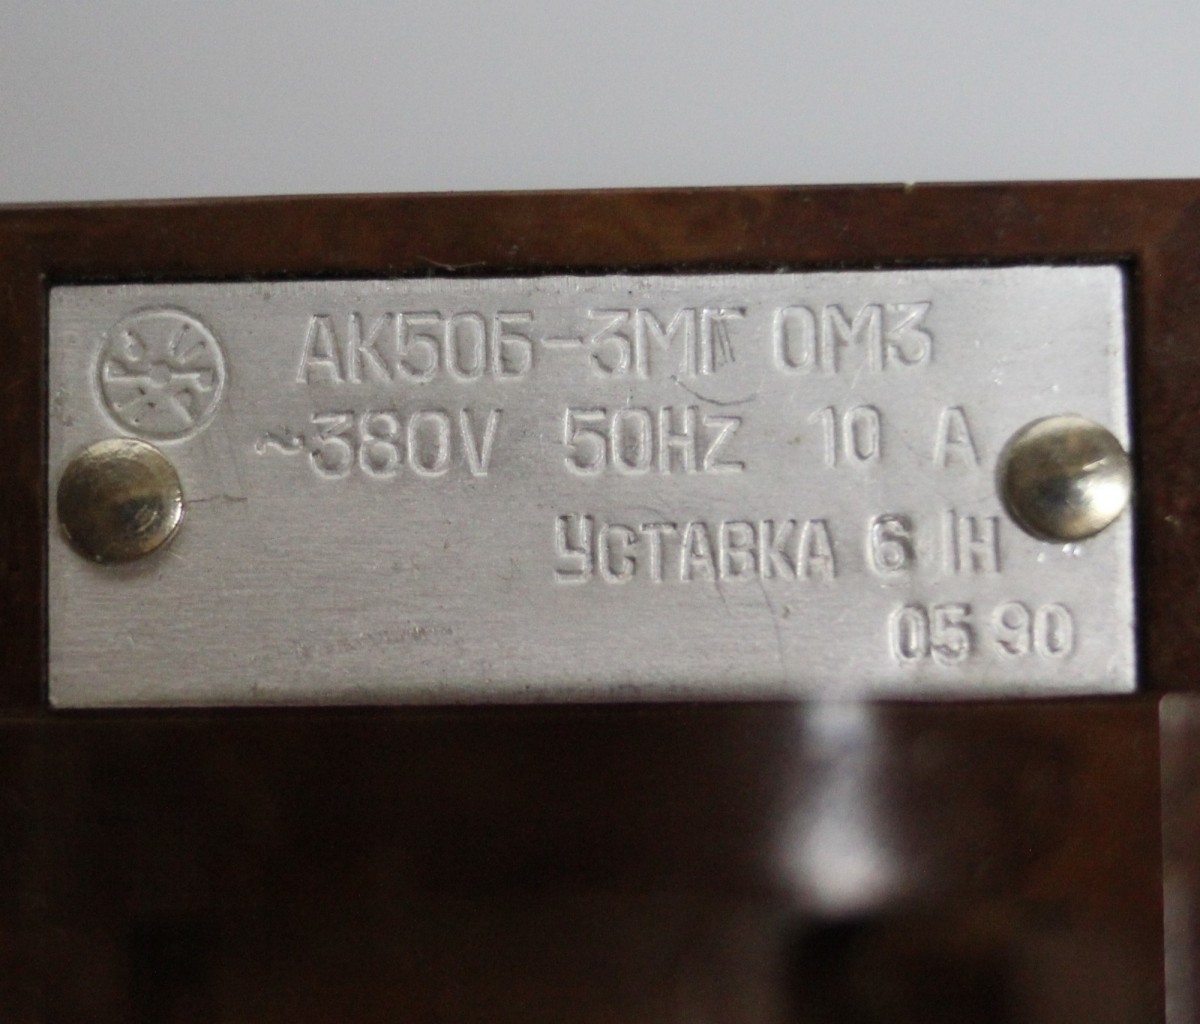 Automatic AK50B-3MG OM3 10A (6)